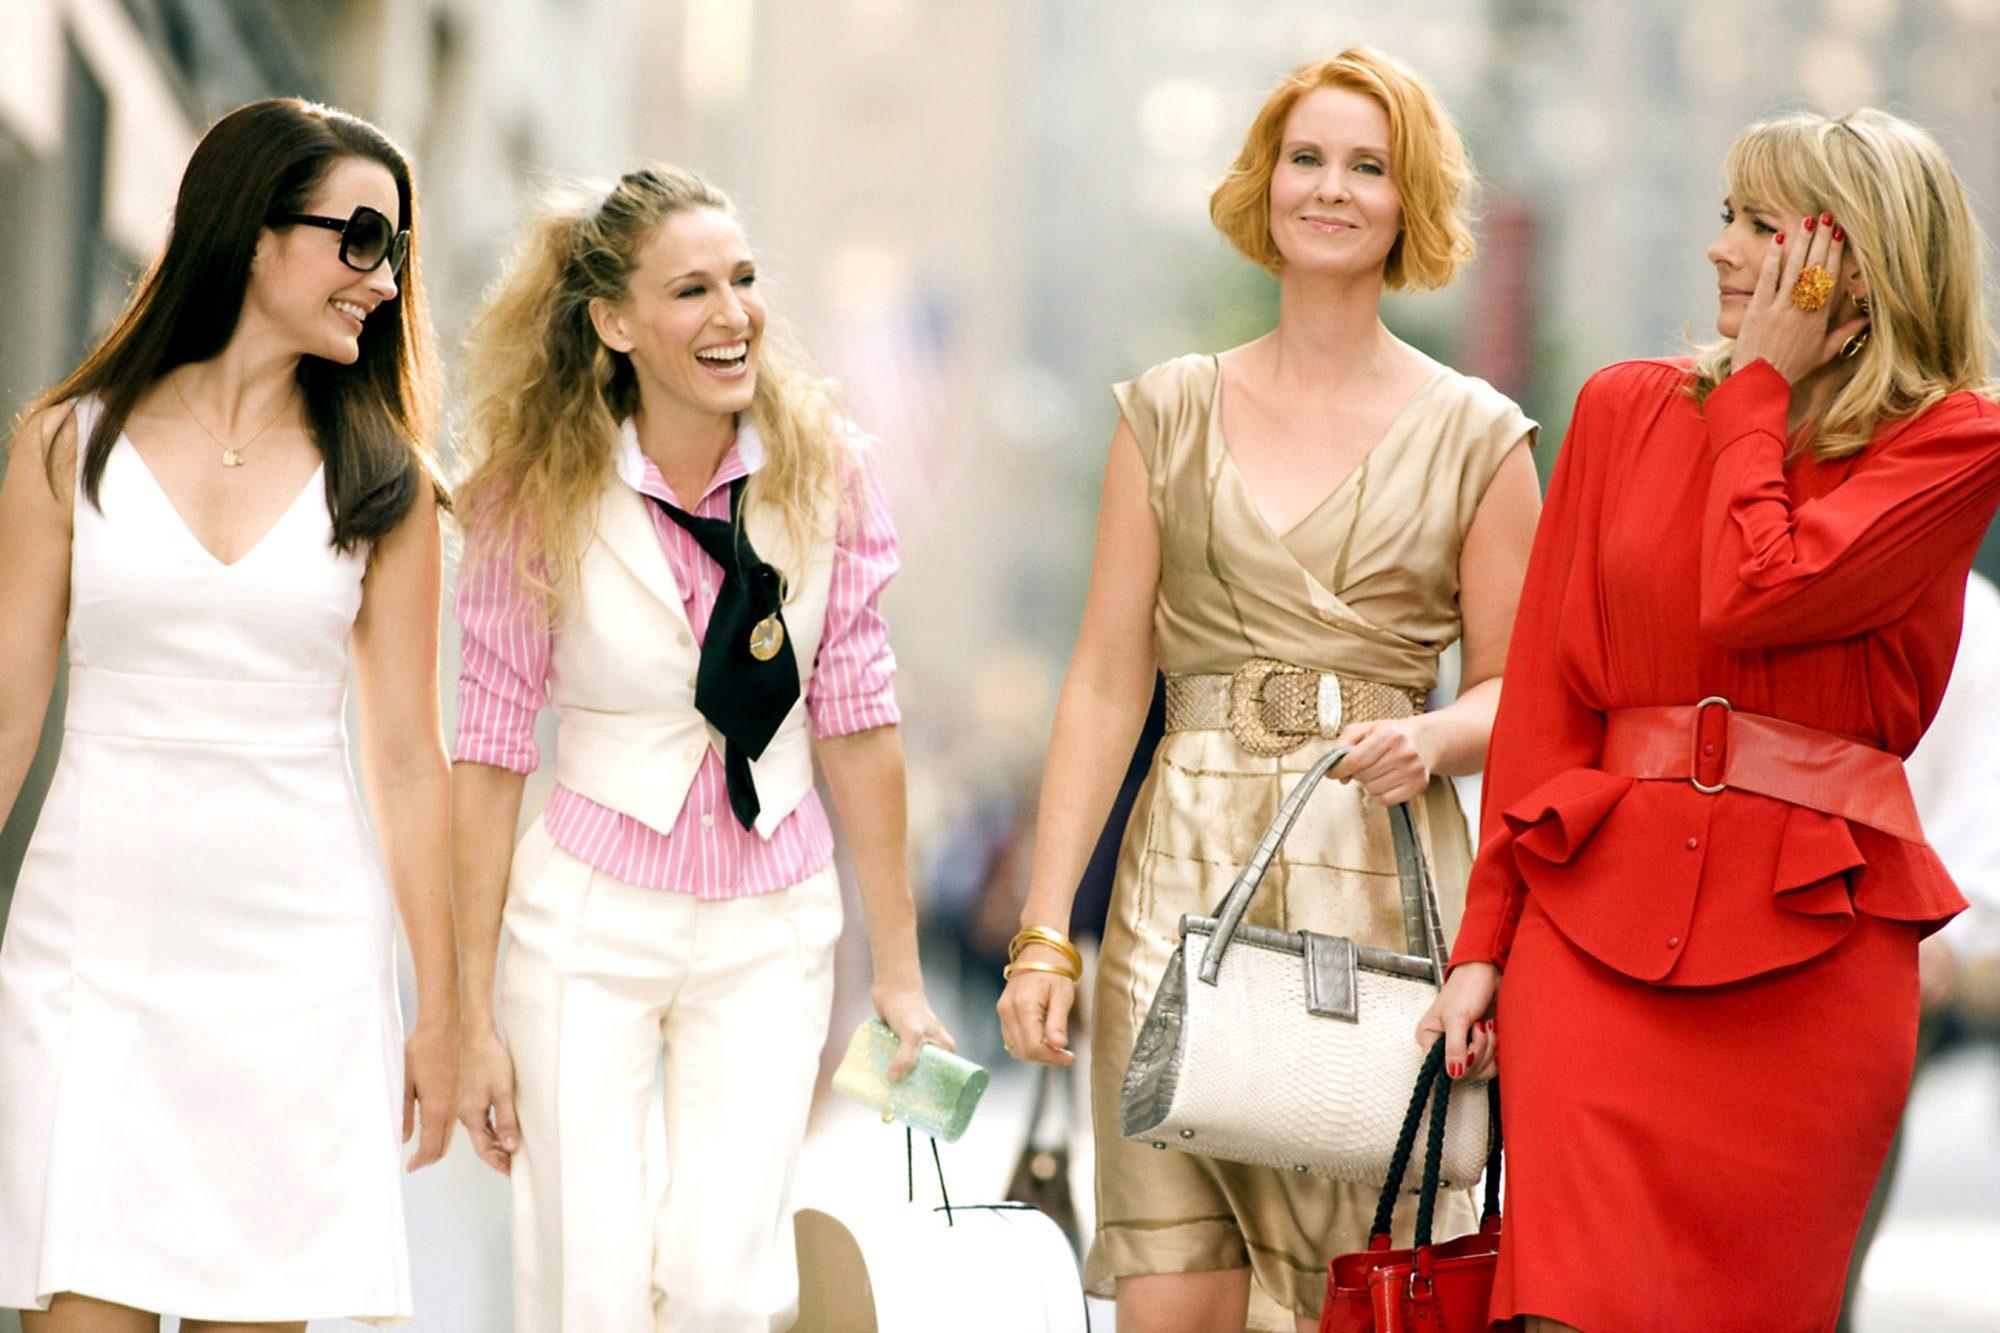 SEX AND THE CITY: THE MOVIE, Kristin Davis, Sarah Jessica Parker, Cynthia Nixon, Kim Cattrall, 2008.